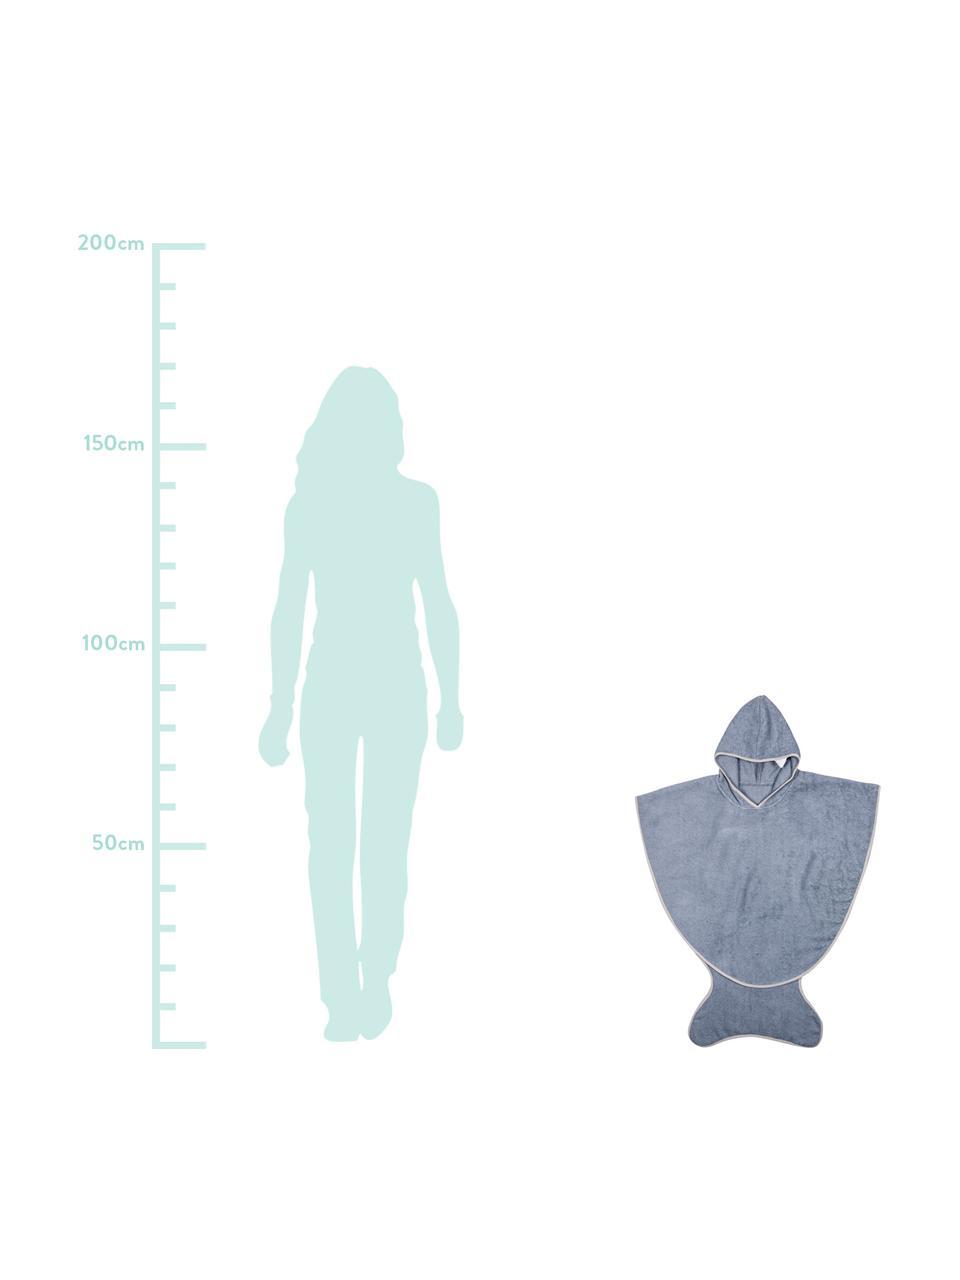 Kinderbadetuch Fish, Baumwolle, Öko-Tex-zertifiziert, Blaugrau, 71 x 87 cm